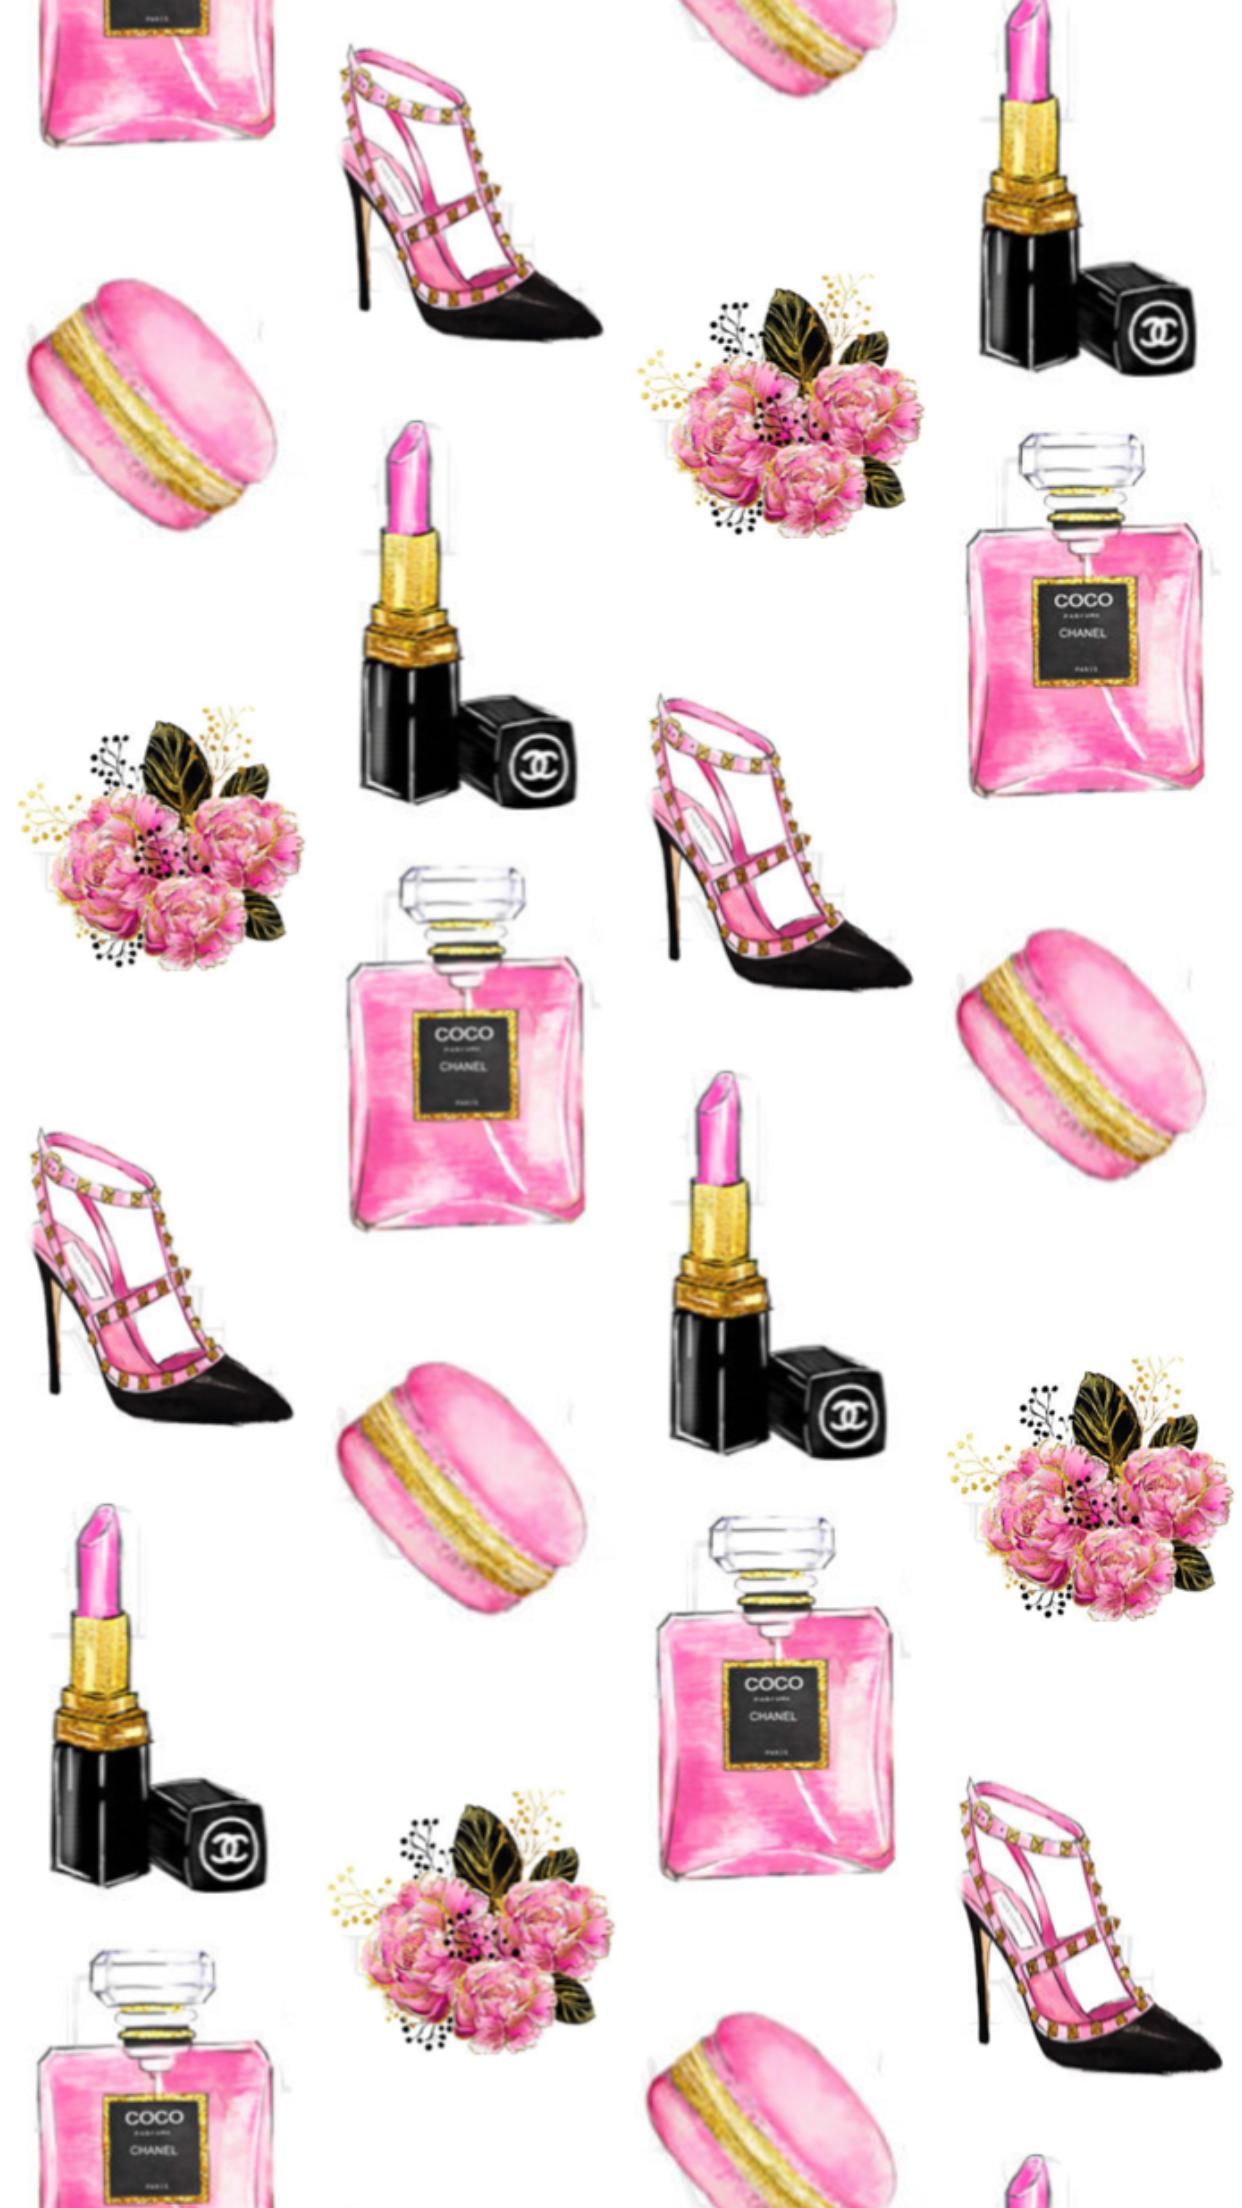 Pinterest: @EnchantedInPink | Backgrounds in 2019 | Chanel wallpapers, Fashion wallpaper ...